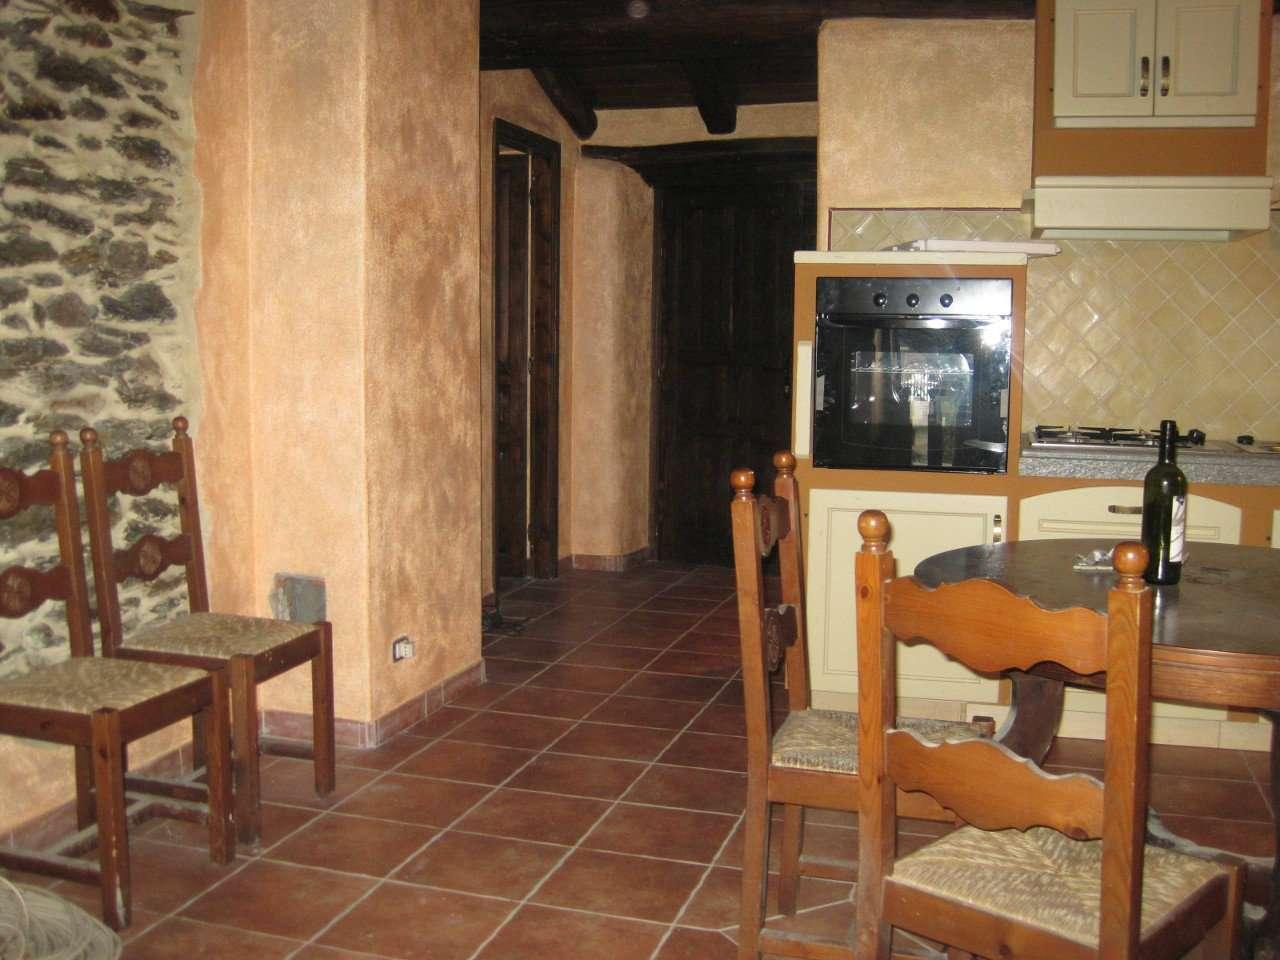 Bilocale Roure Via Balma, 140 2